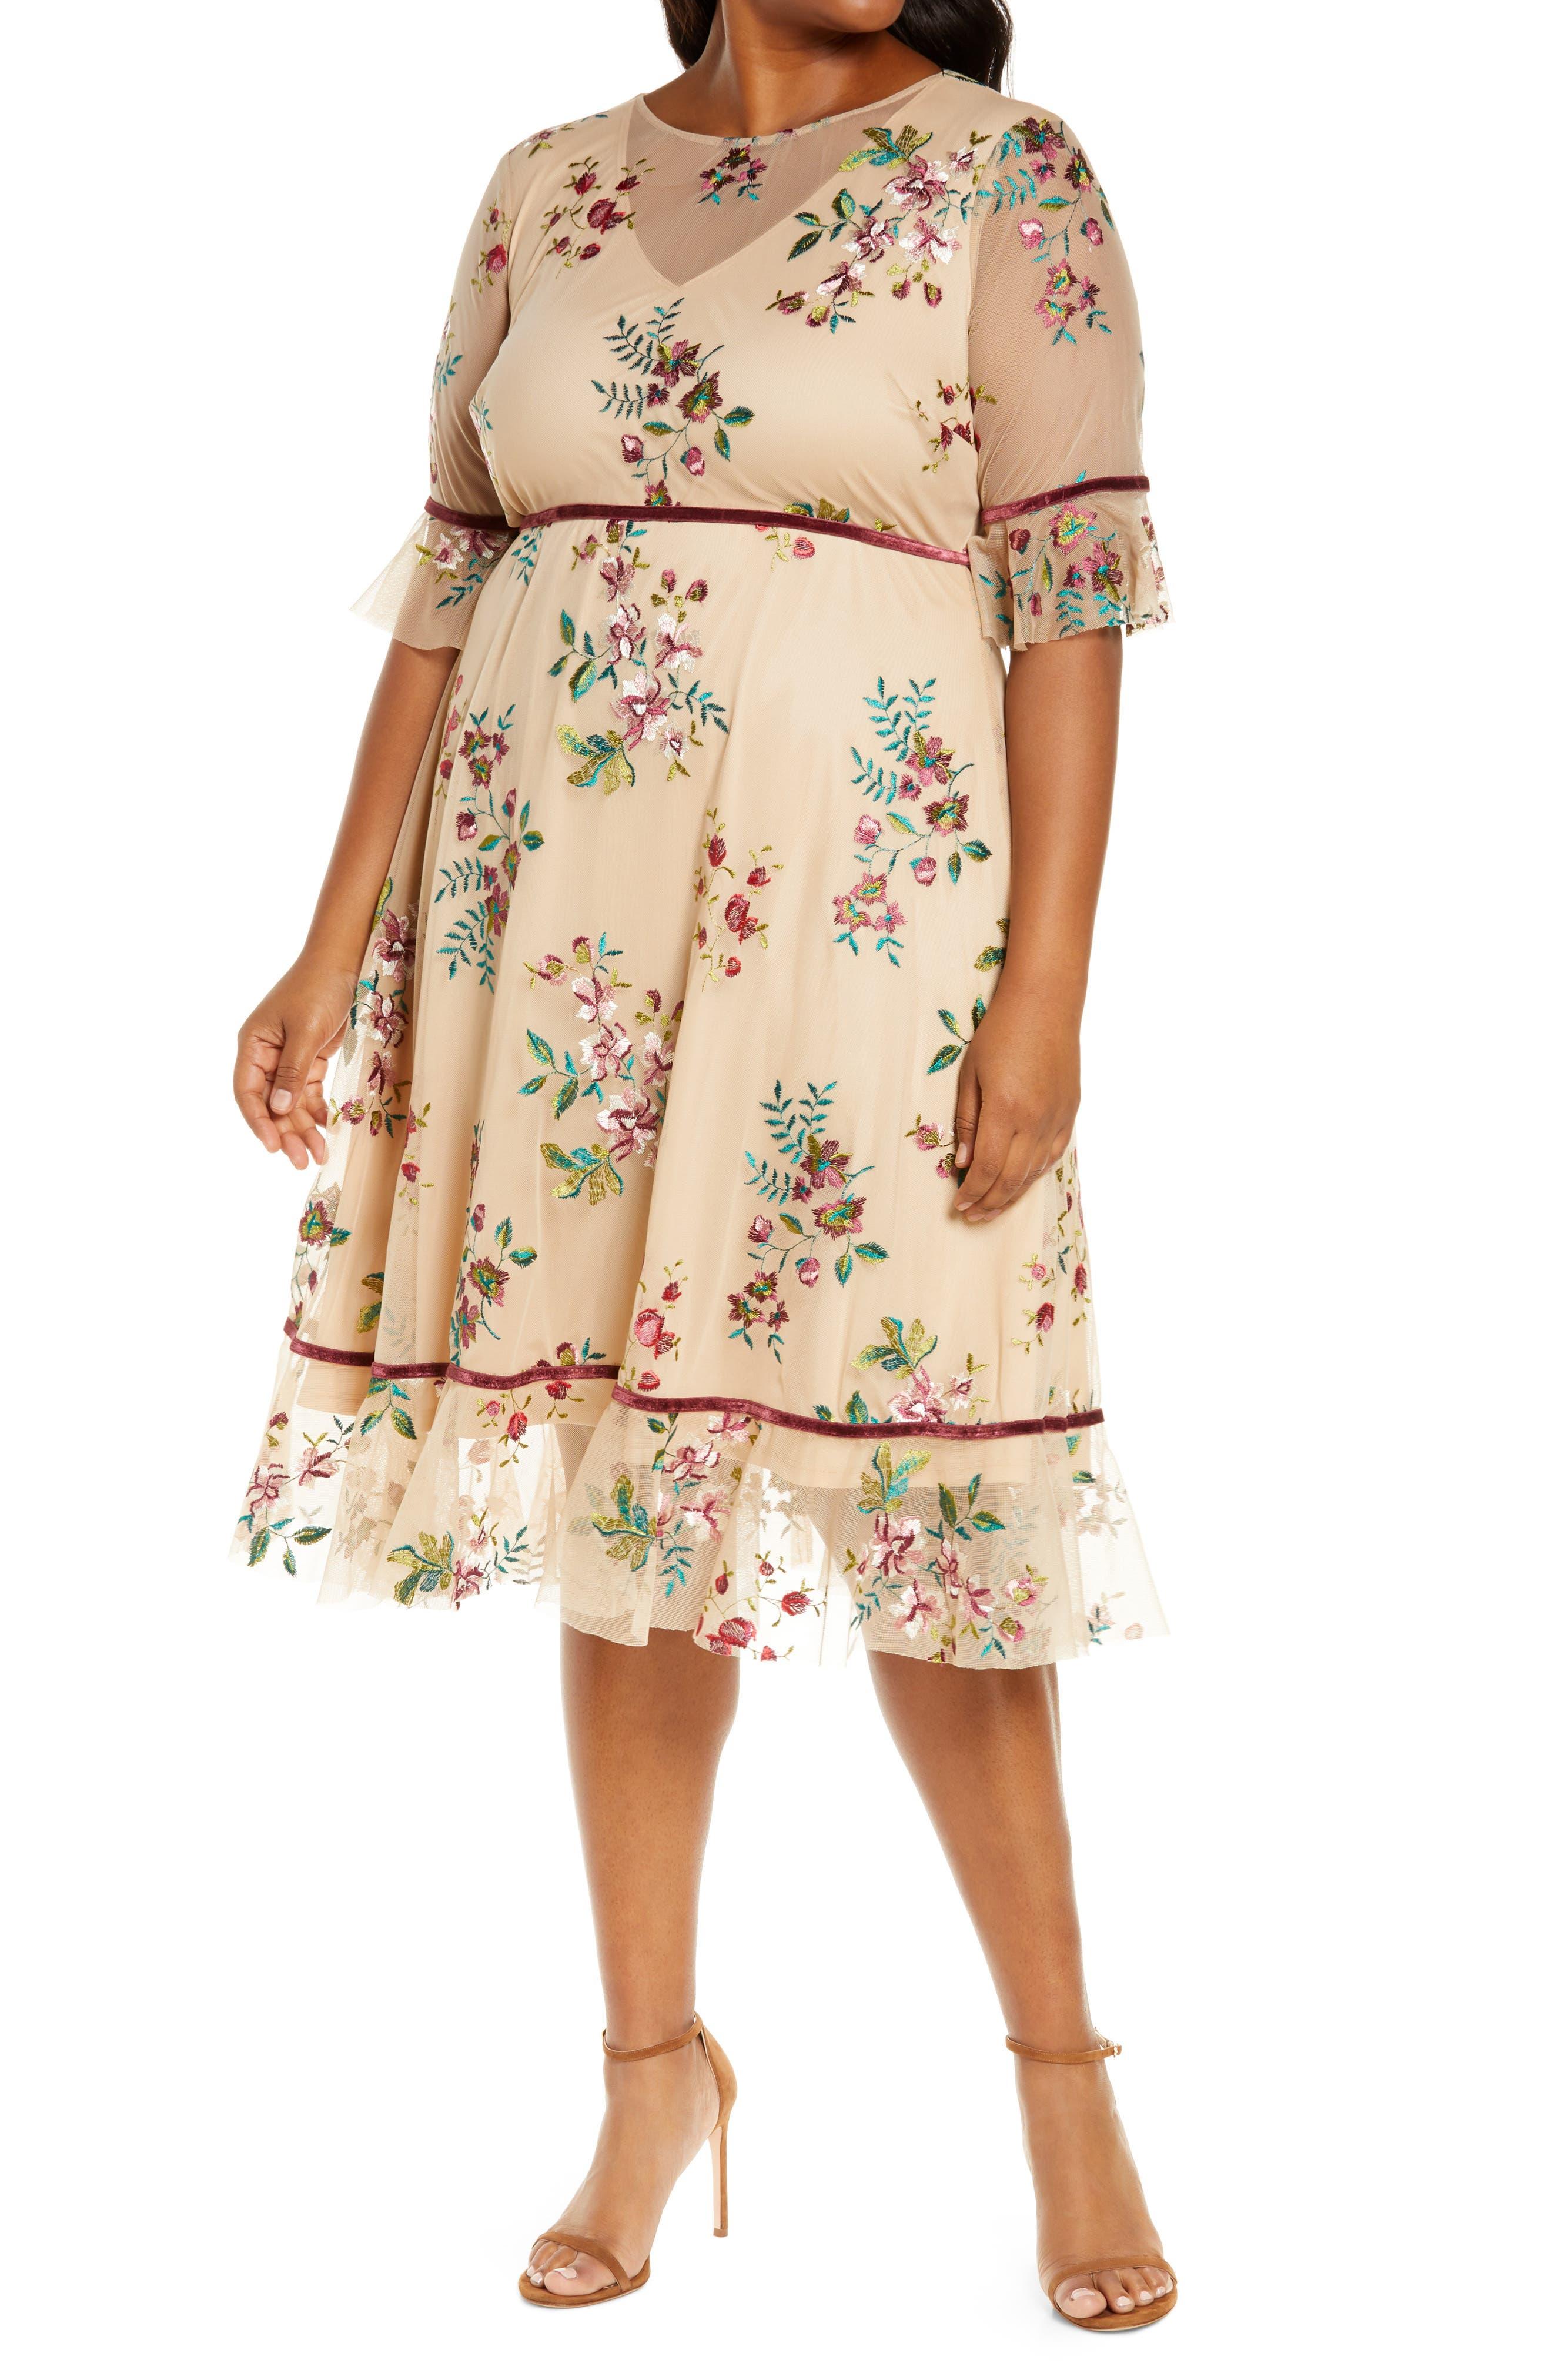 Wildflower Embroidered Dress